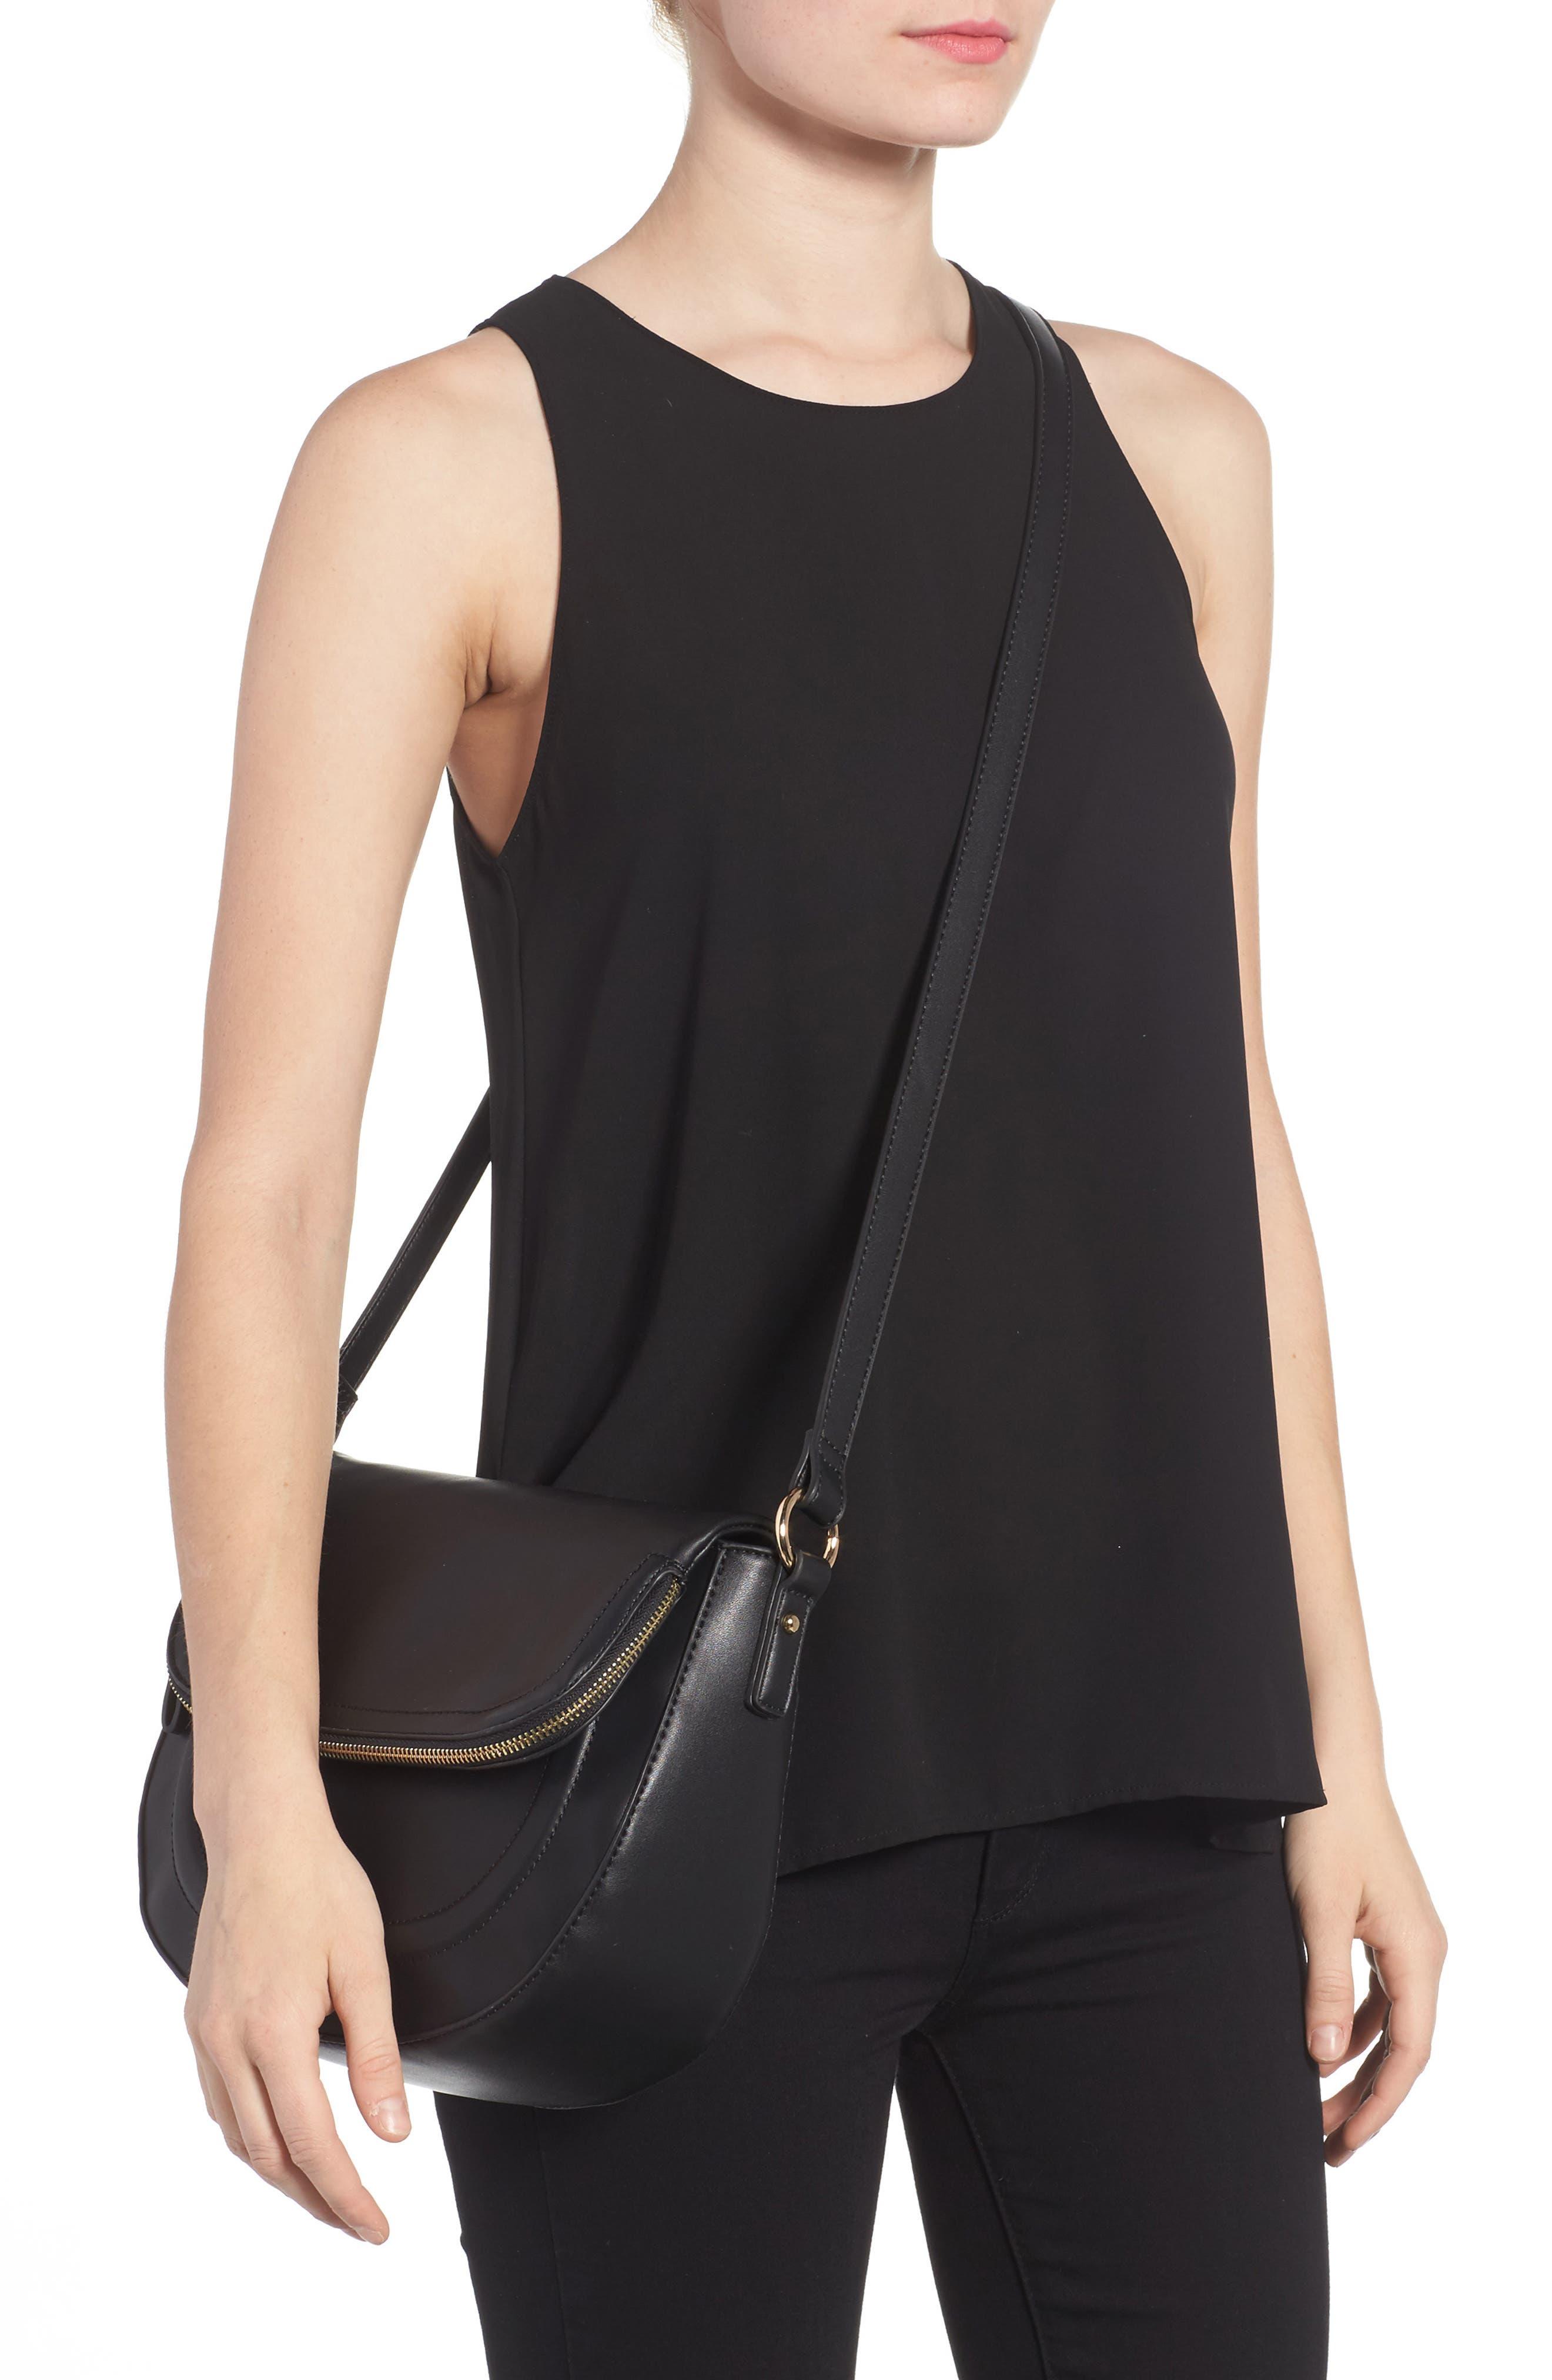 Adden Faux Leather Crossbody Bag,                             Alternate thumbnail 2, color,                             Black